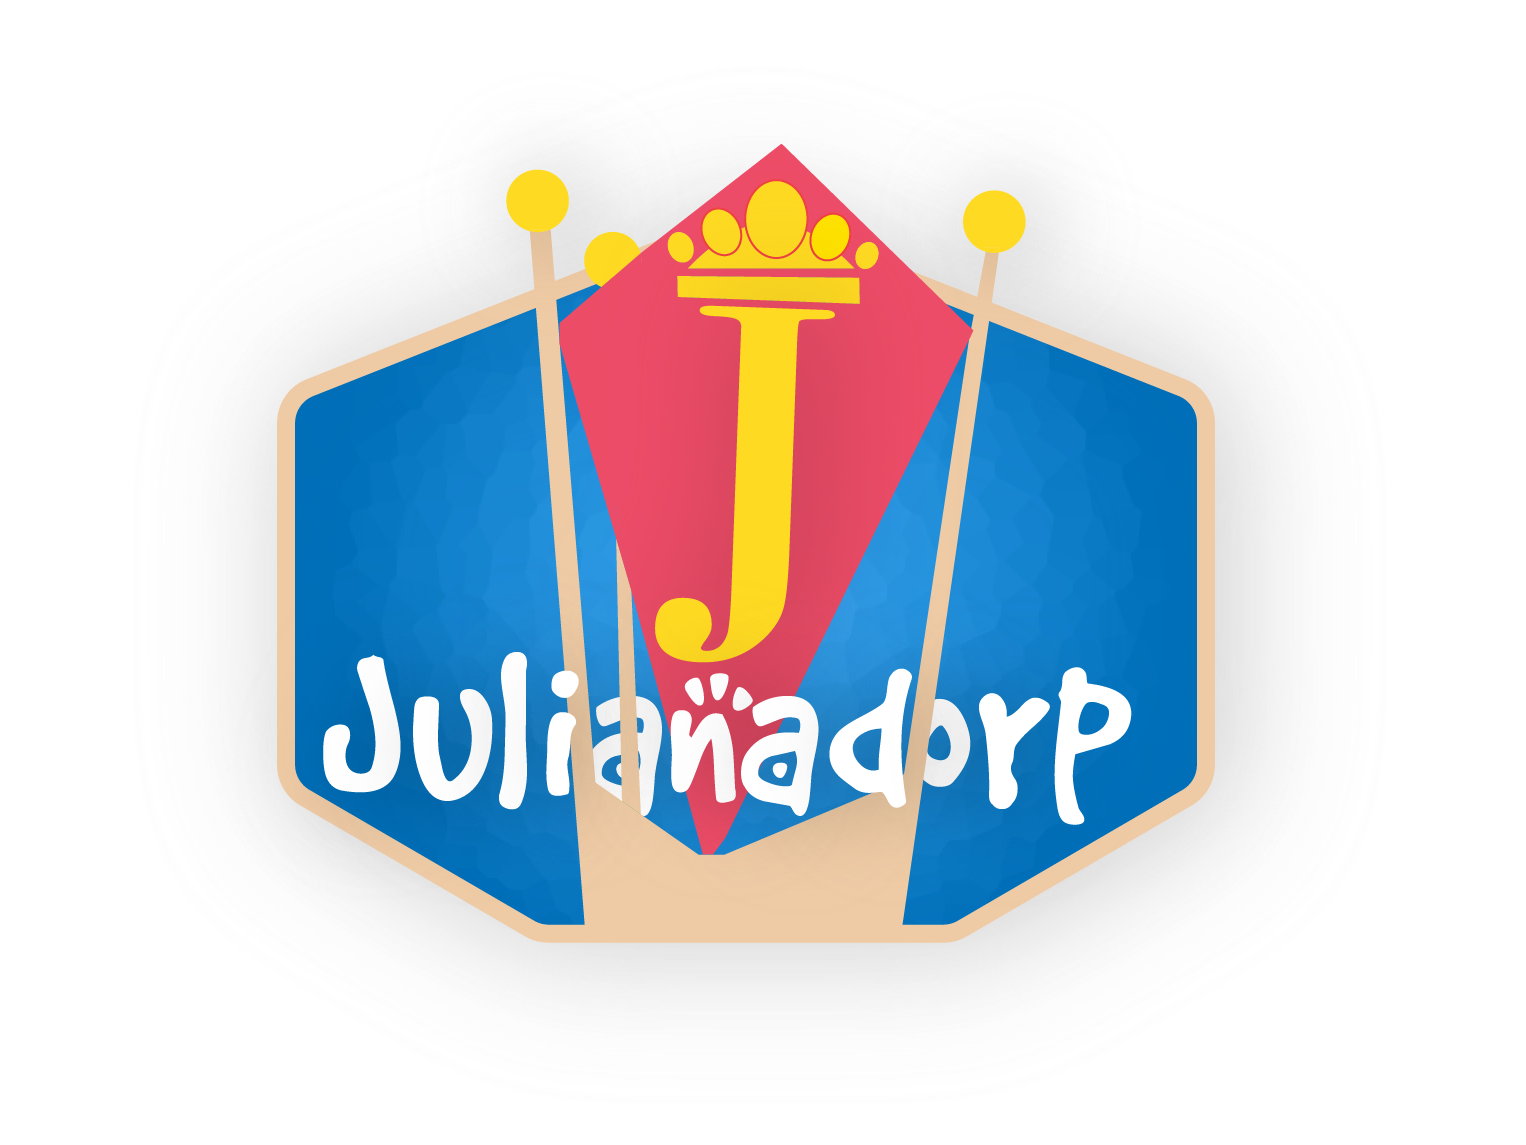 Julianadorp, snapchatfilter ux ui web typography logodesign graphicdesign illustration flat branding design logo thenetherlands julianadorp snapfilter geofilter filter snapchat